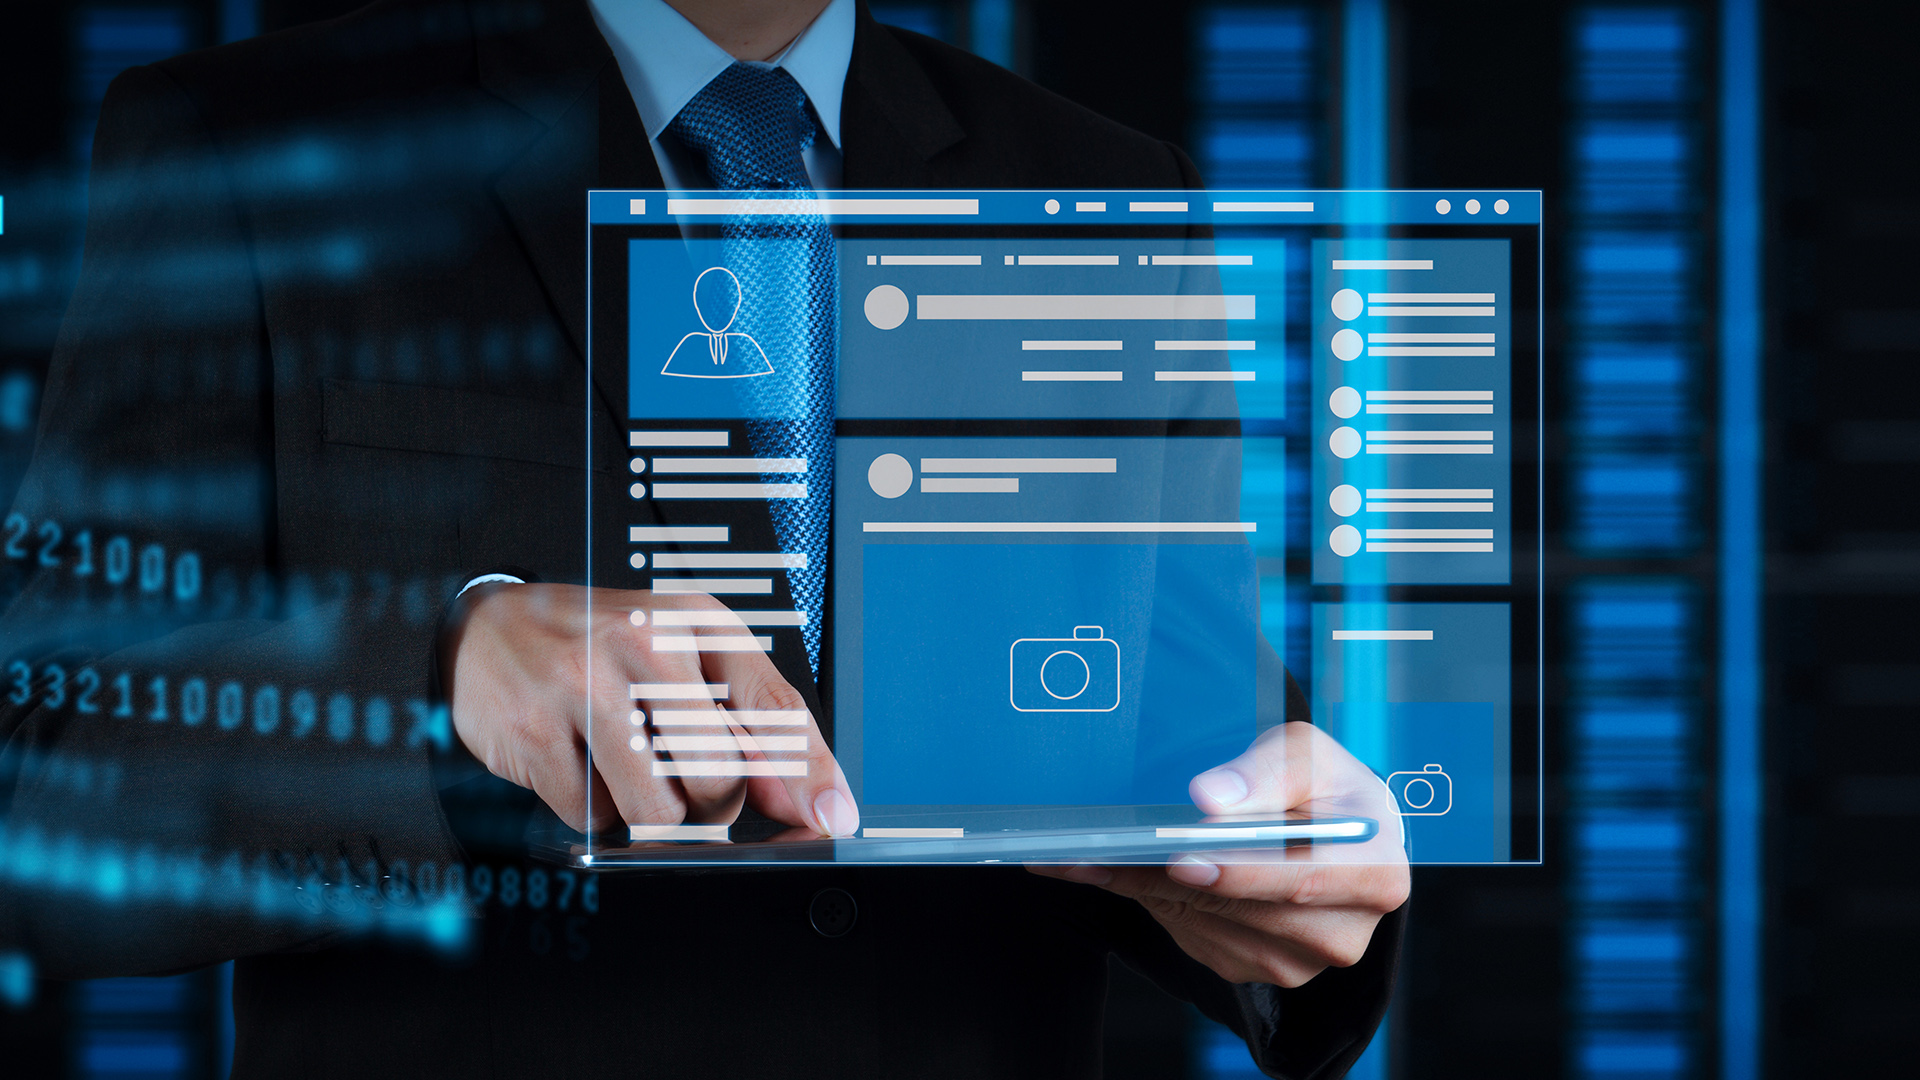 Portale, usługi i aplikacje